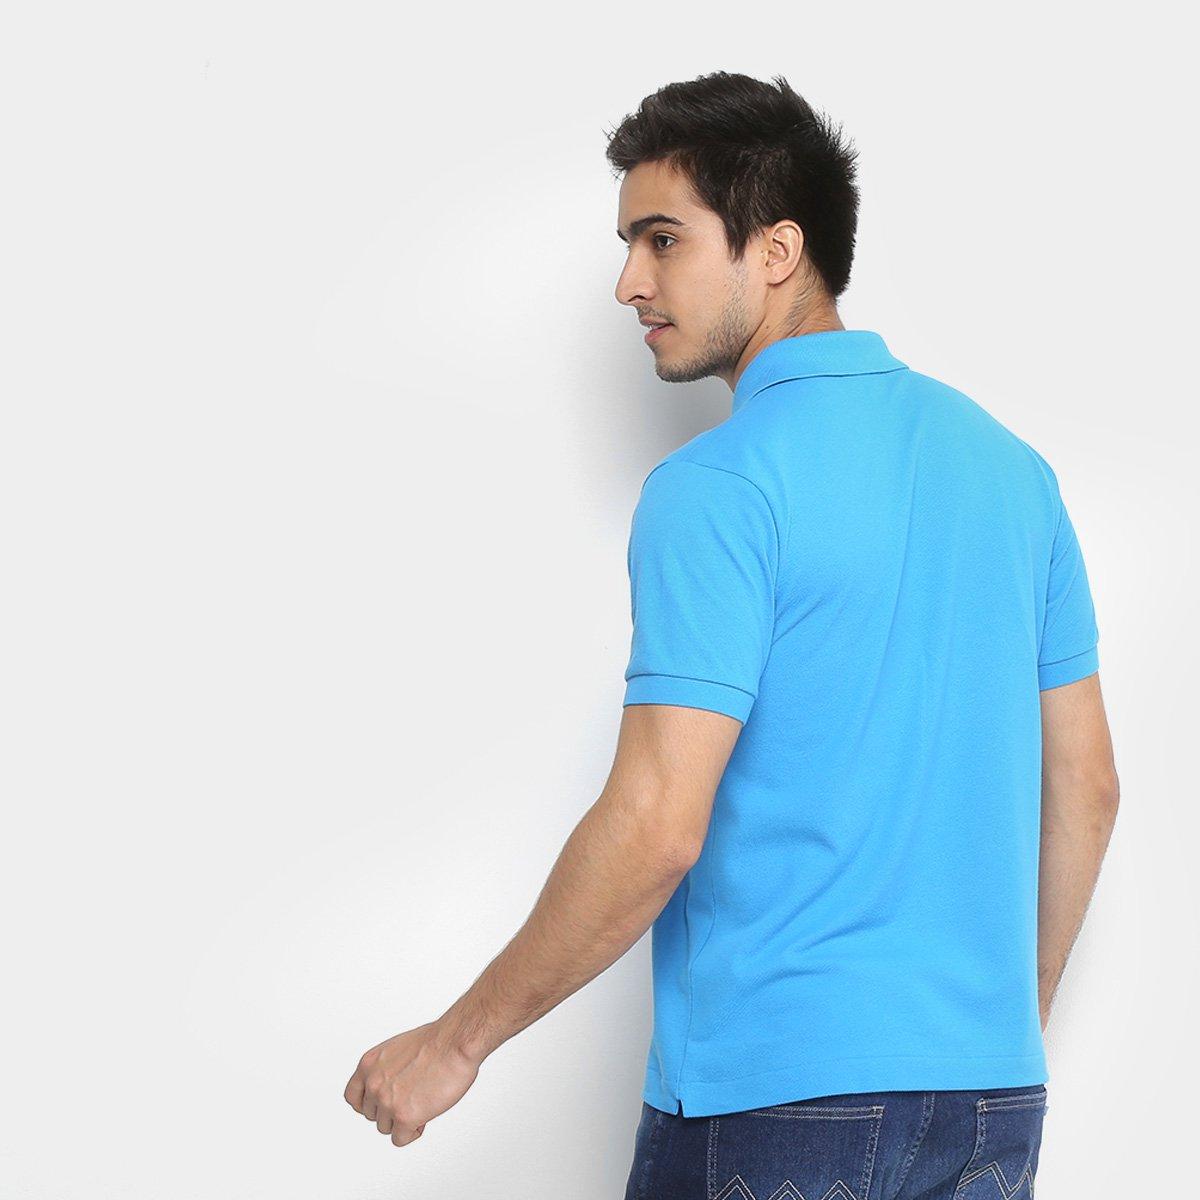 Camisa Polo Lacoste Piquet Original Fit Masculina - Shopping TudoAzul 83c447eedb496